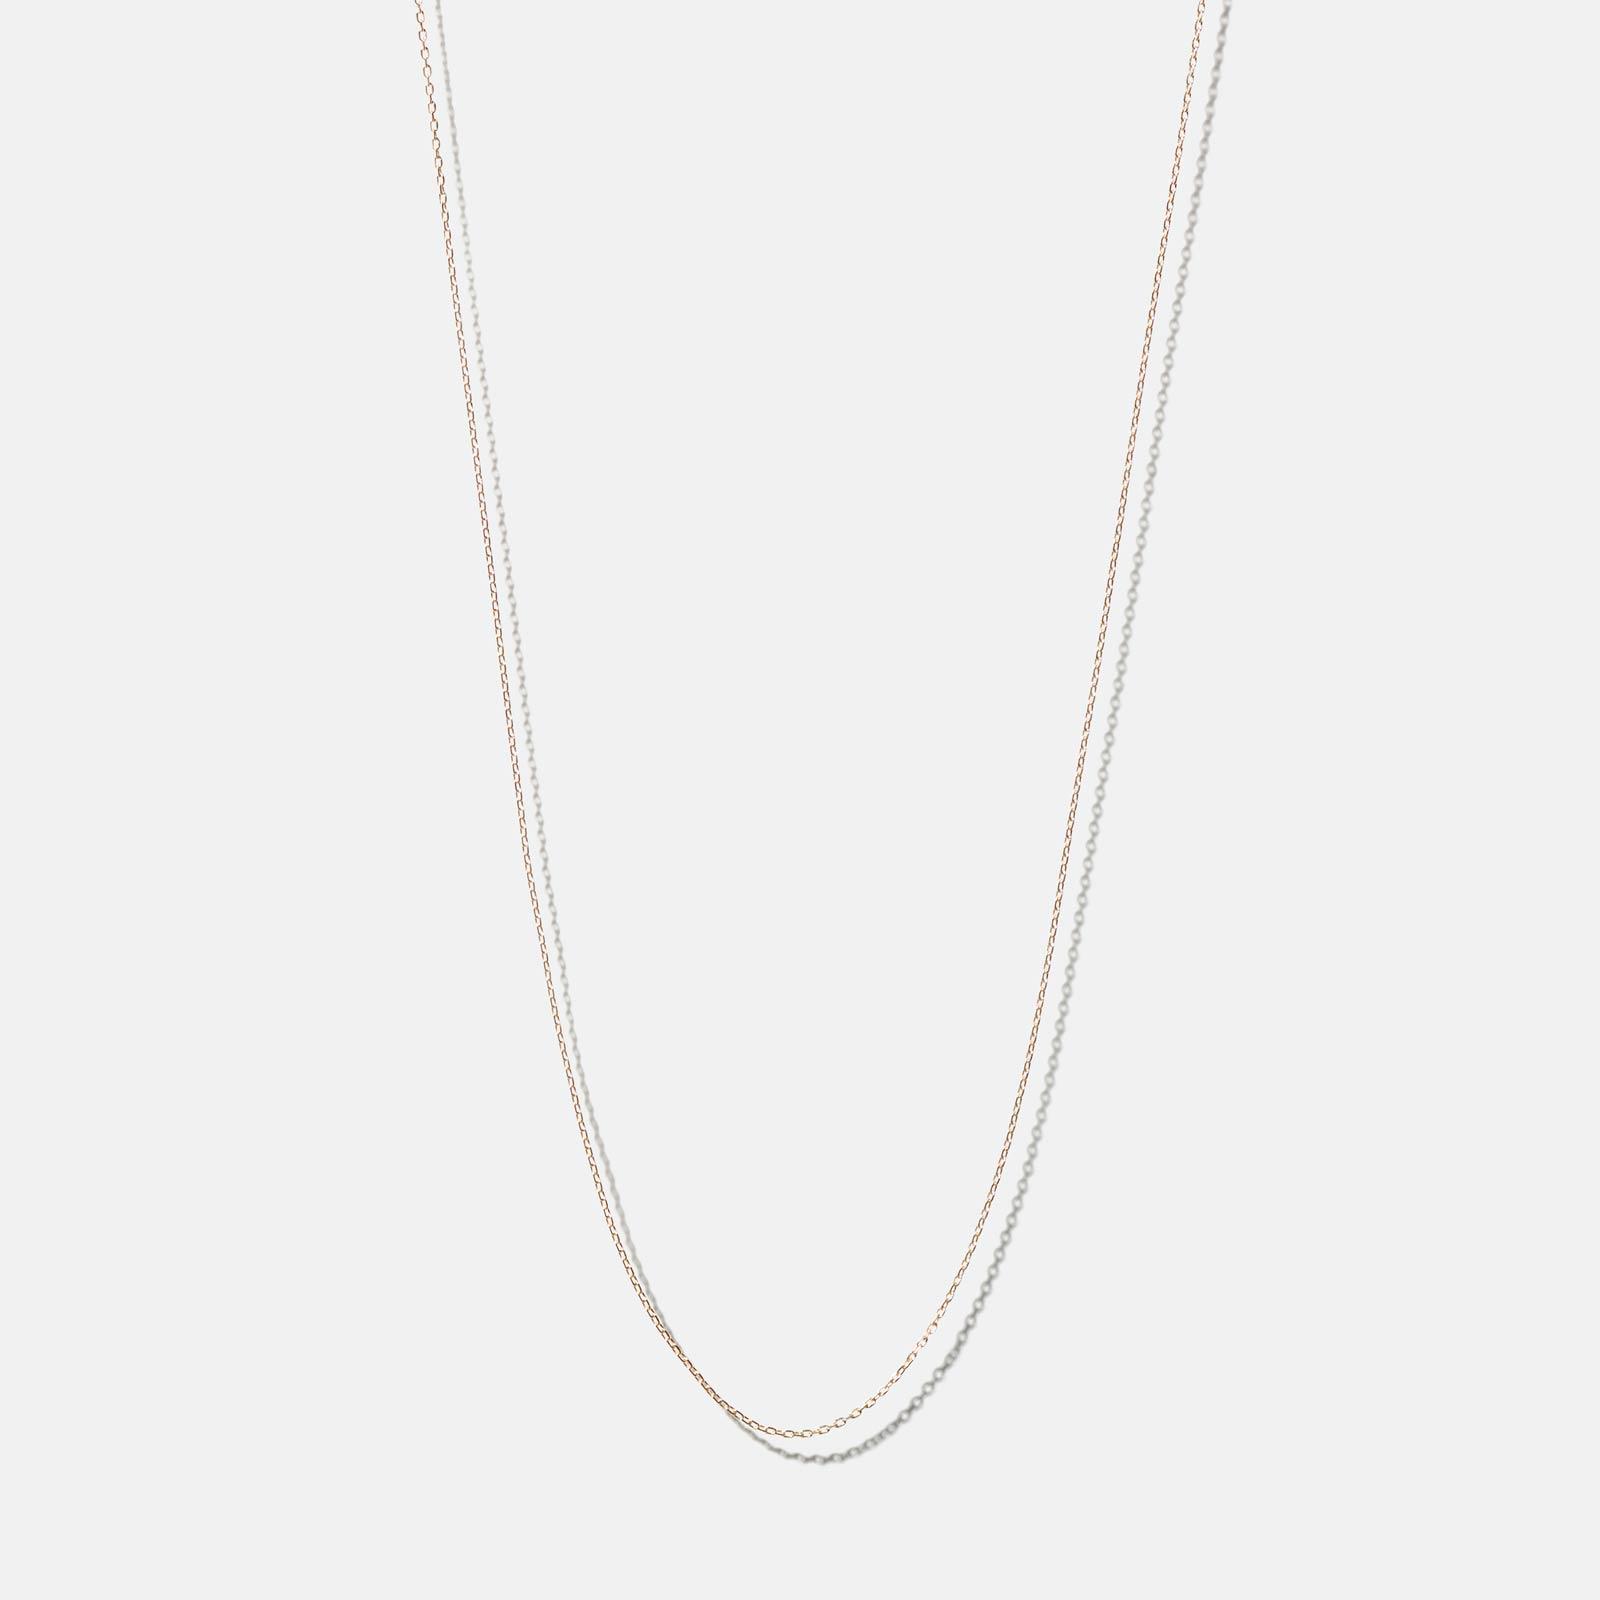 Halsband 18k guld - ankarkedja 42 cm